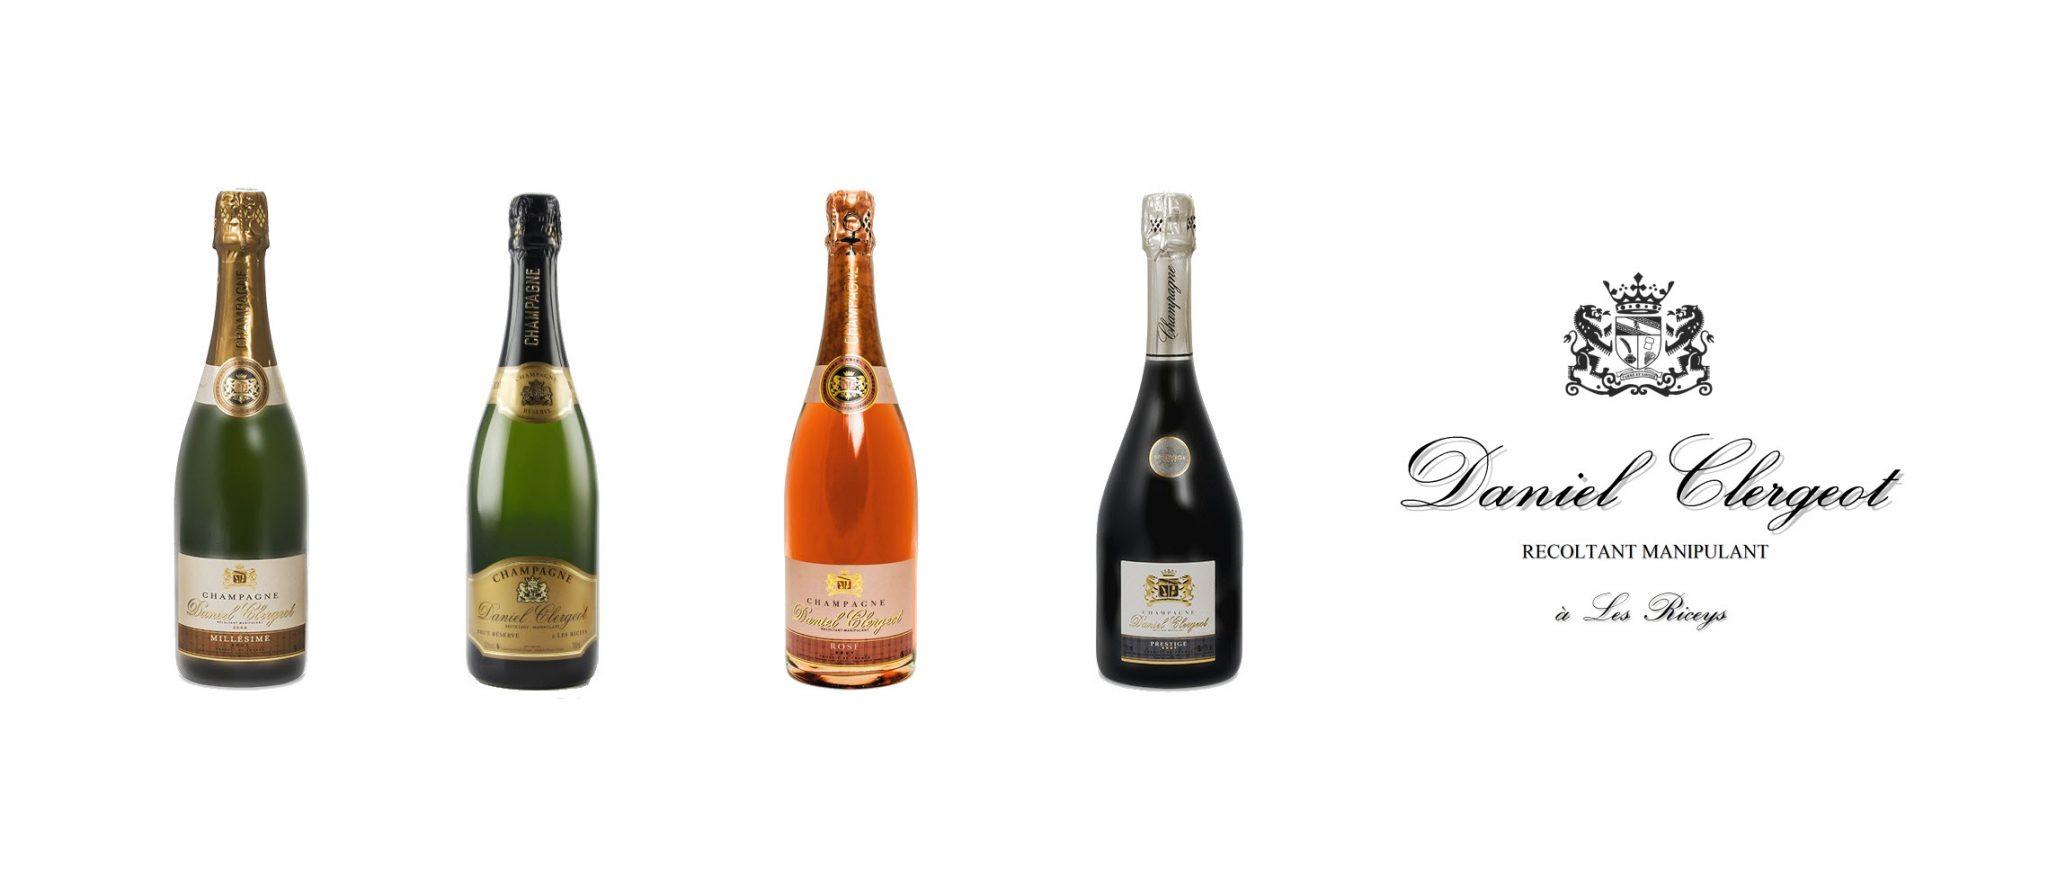 Champagne Daniel Clergeot